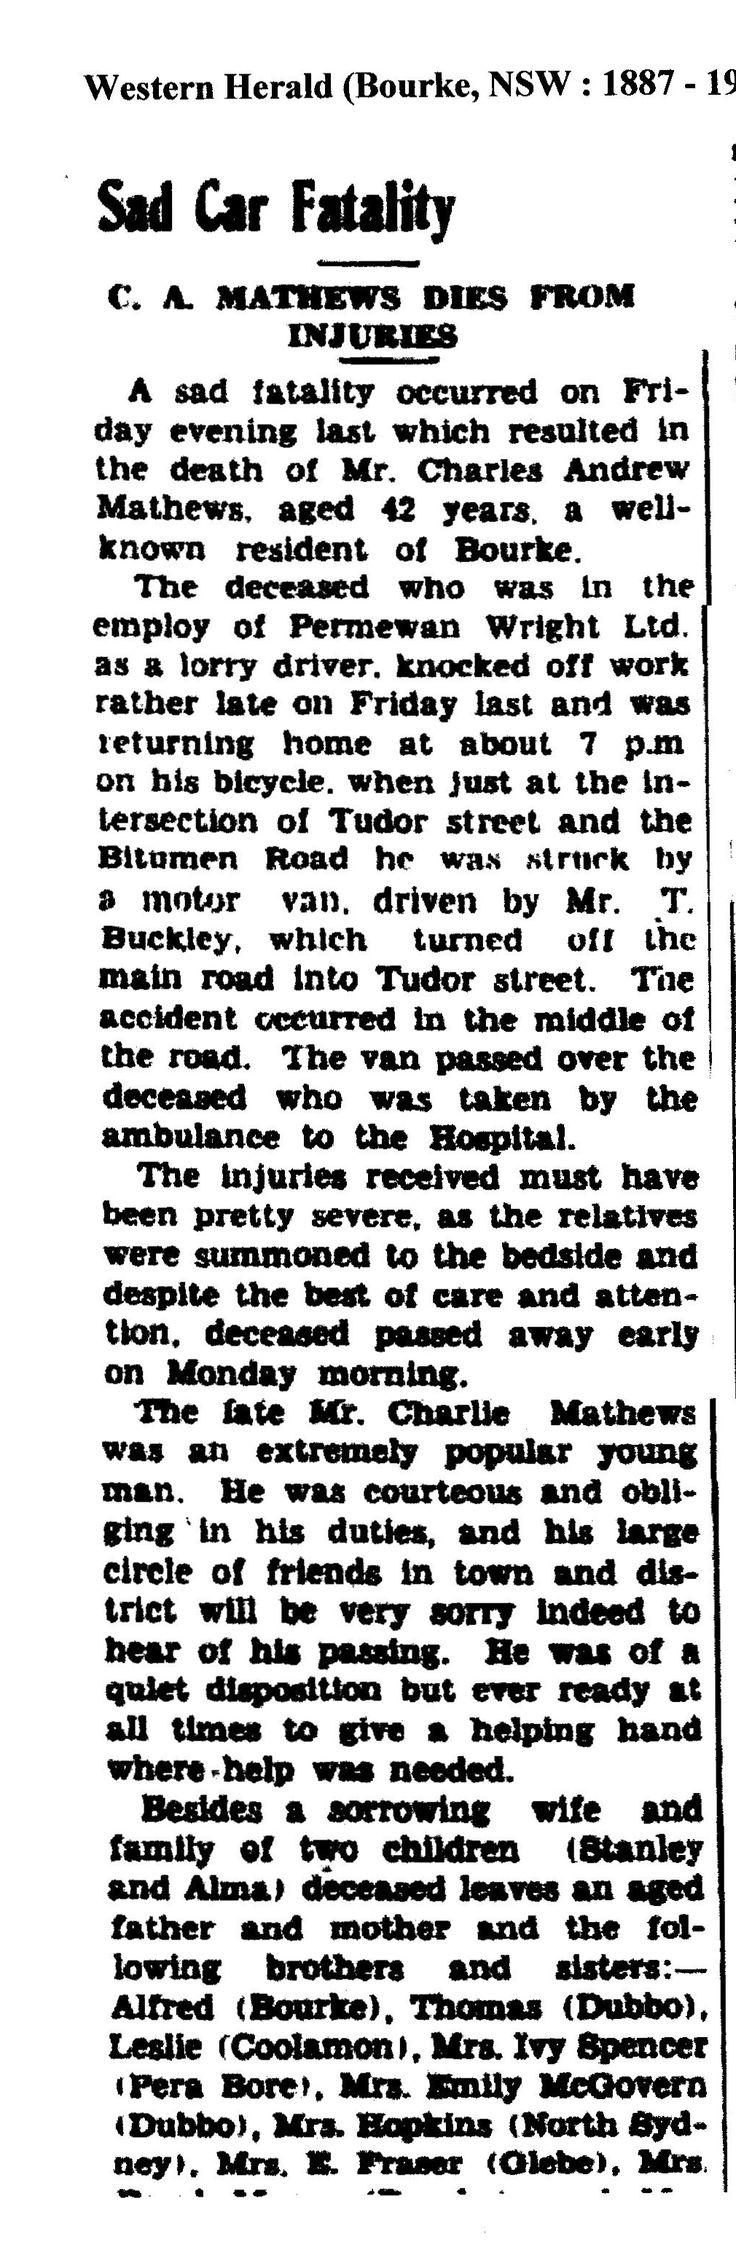 Part 1 ; Charles Mathews accidently killed 1945, son Stan Mathews.